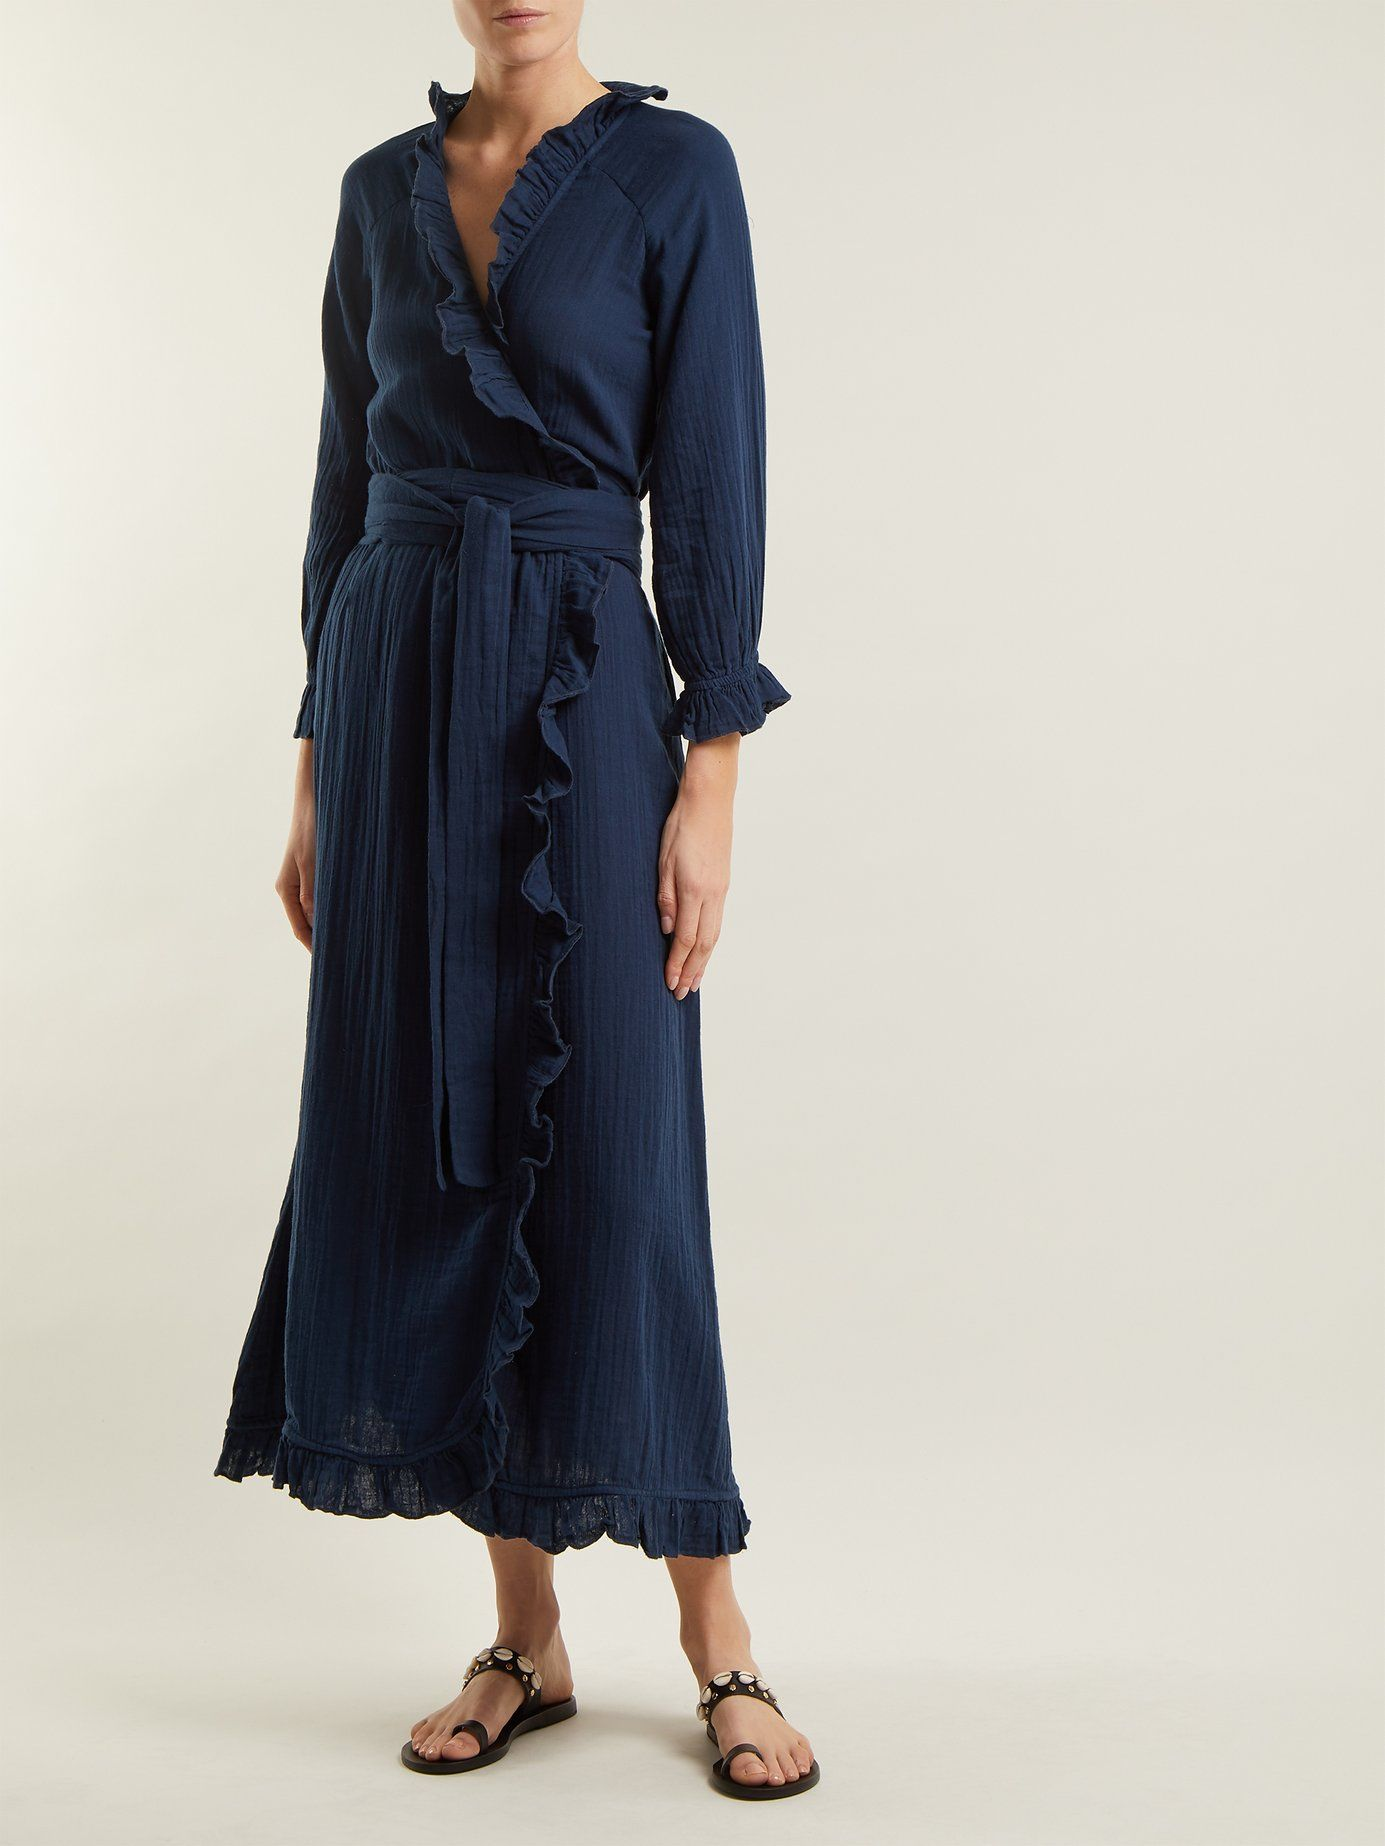 77b2dd252db4 RHODE RESORT Jagger Ruffle-Trimmed Cotton Wrap Navy Blue Dress in ...